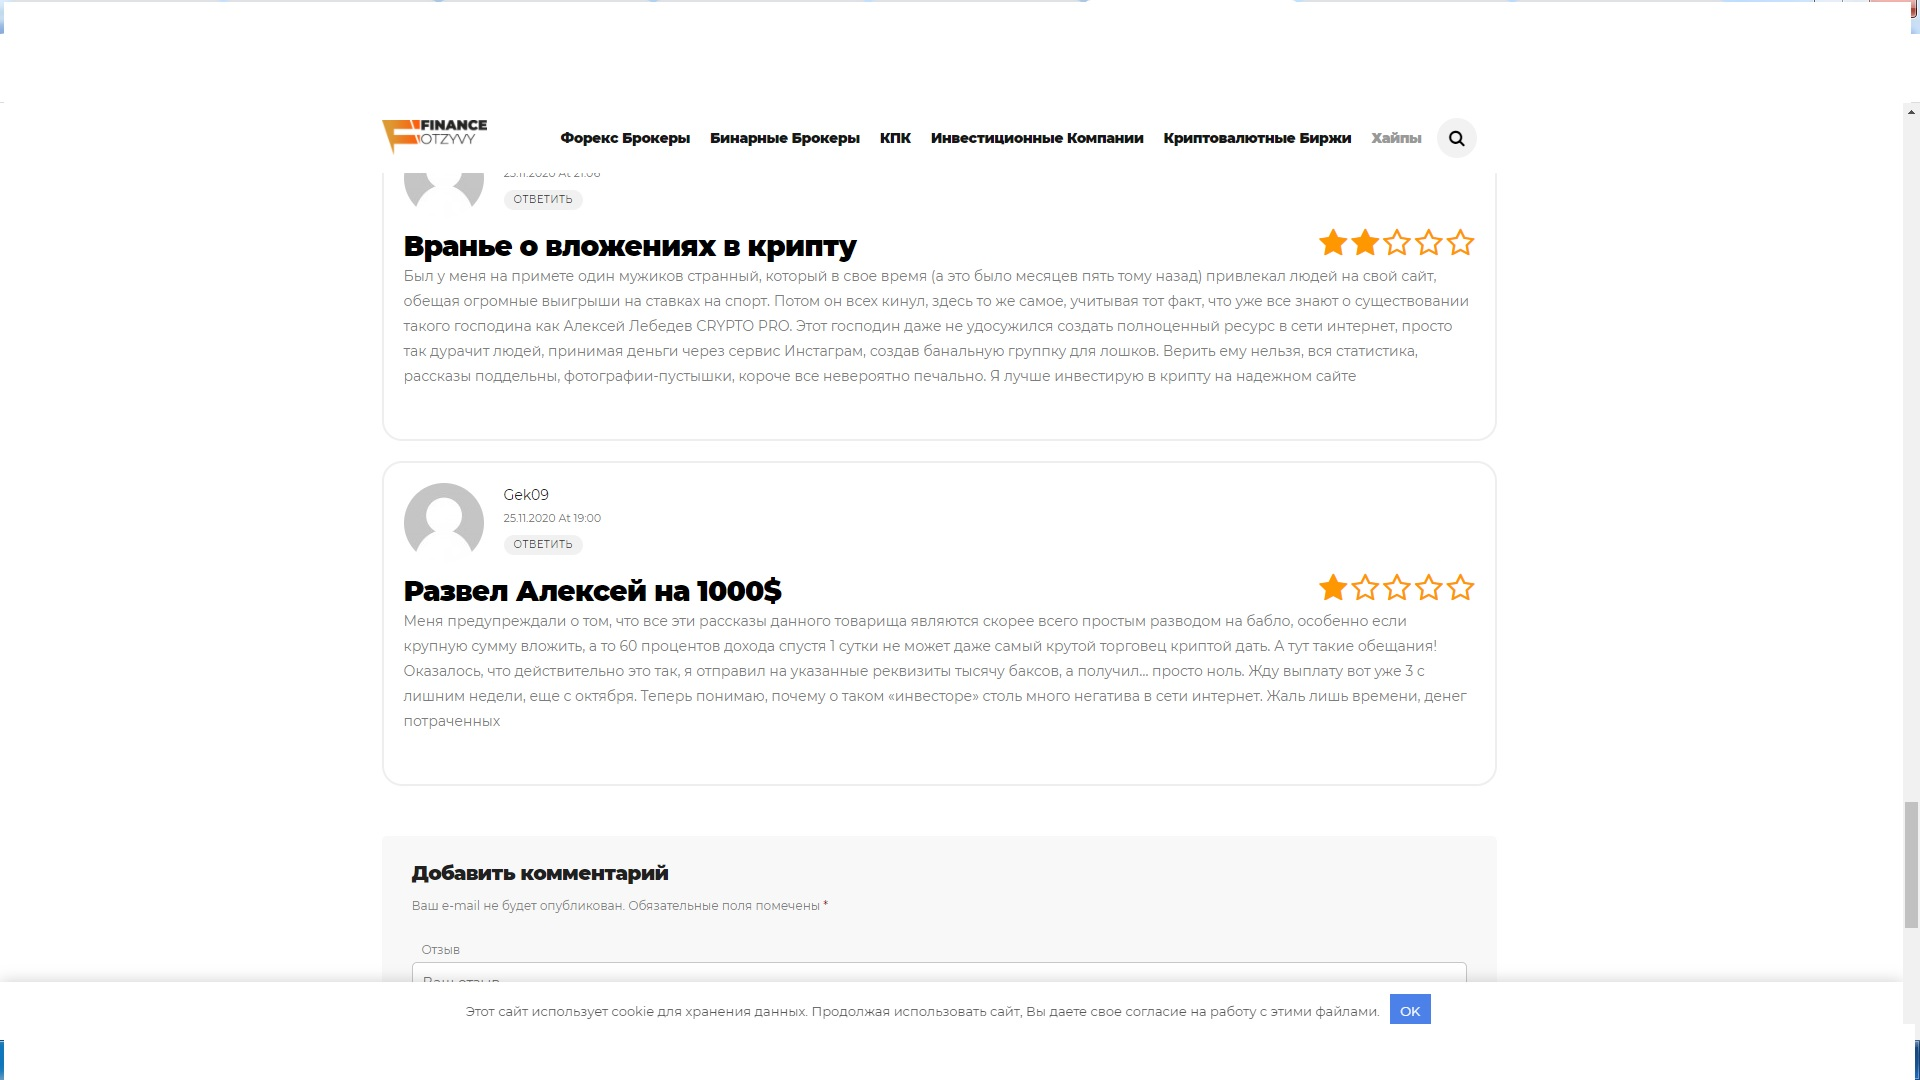 Отзывы об «Инстаграме» Алексея Лебедева Crypto pro